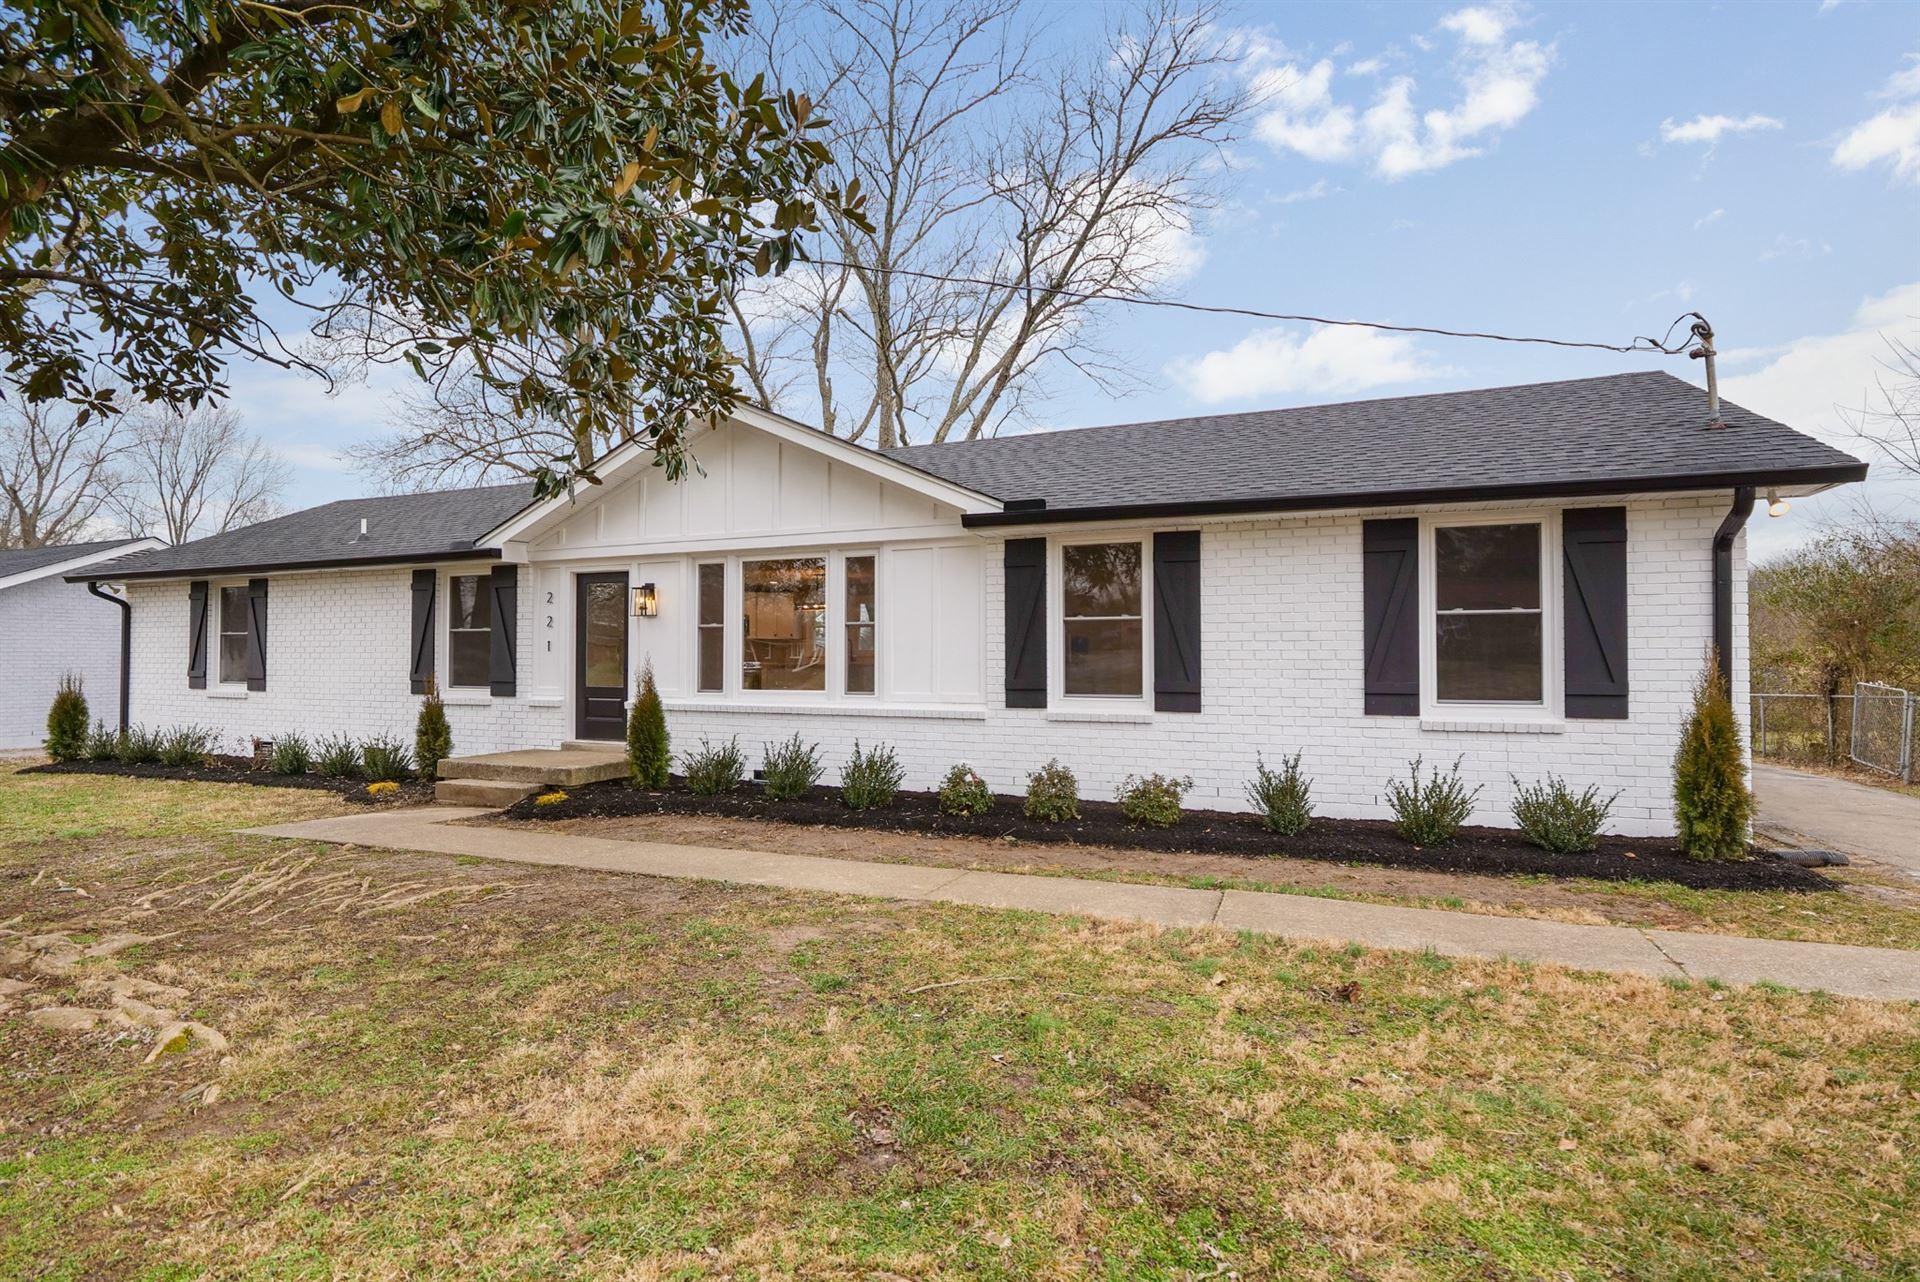 221 Wessington Pl, Hendersonville, TN 37075 - MLS#: 2229996